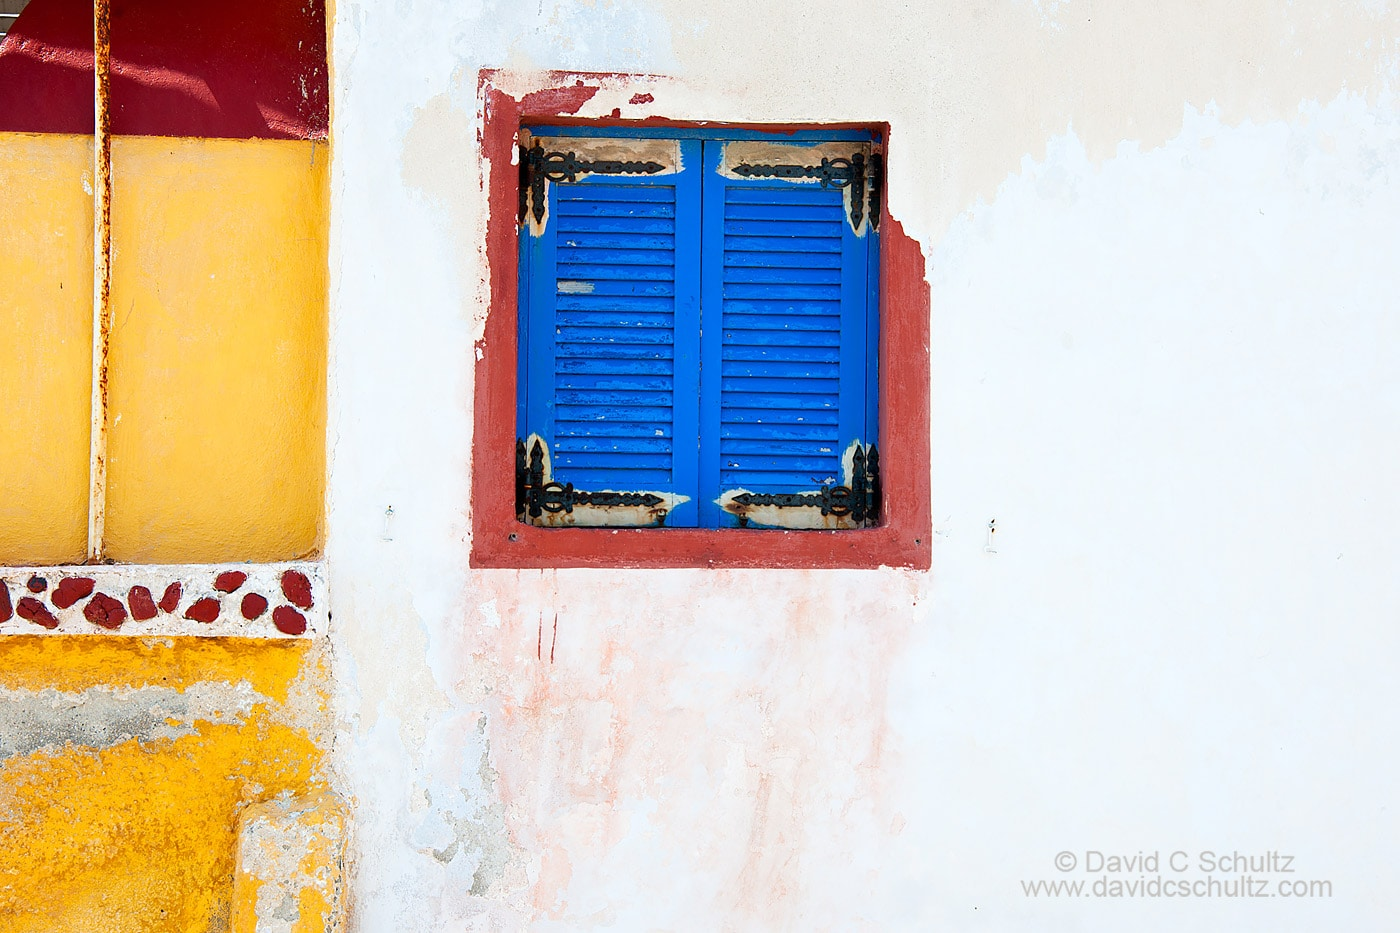 Oia, Santorini, Greece - Image #202-266